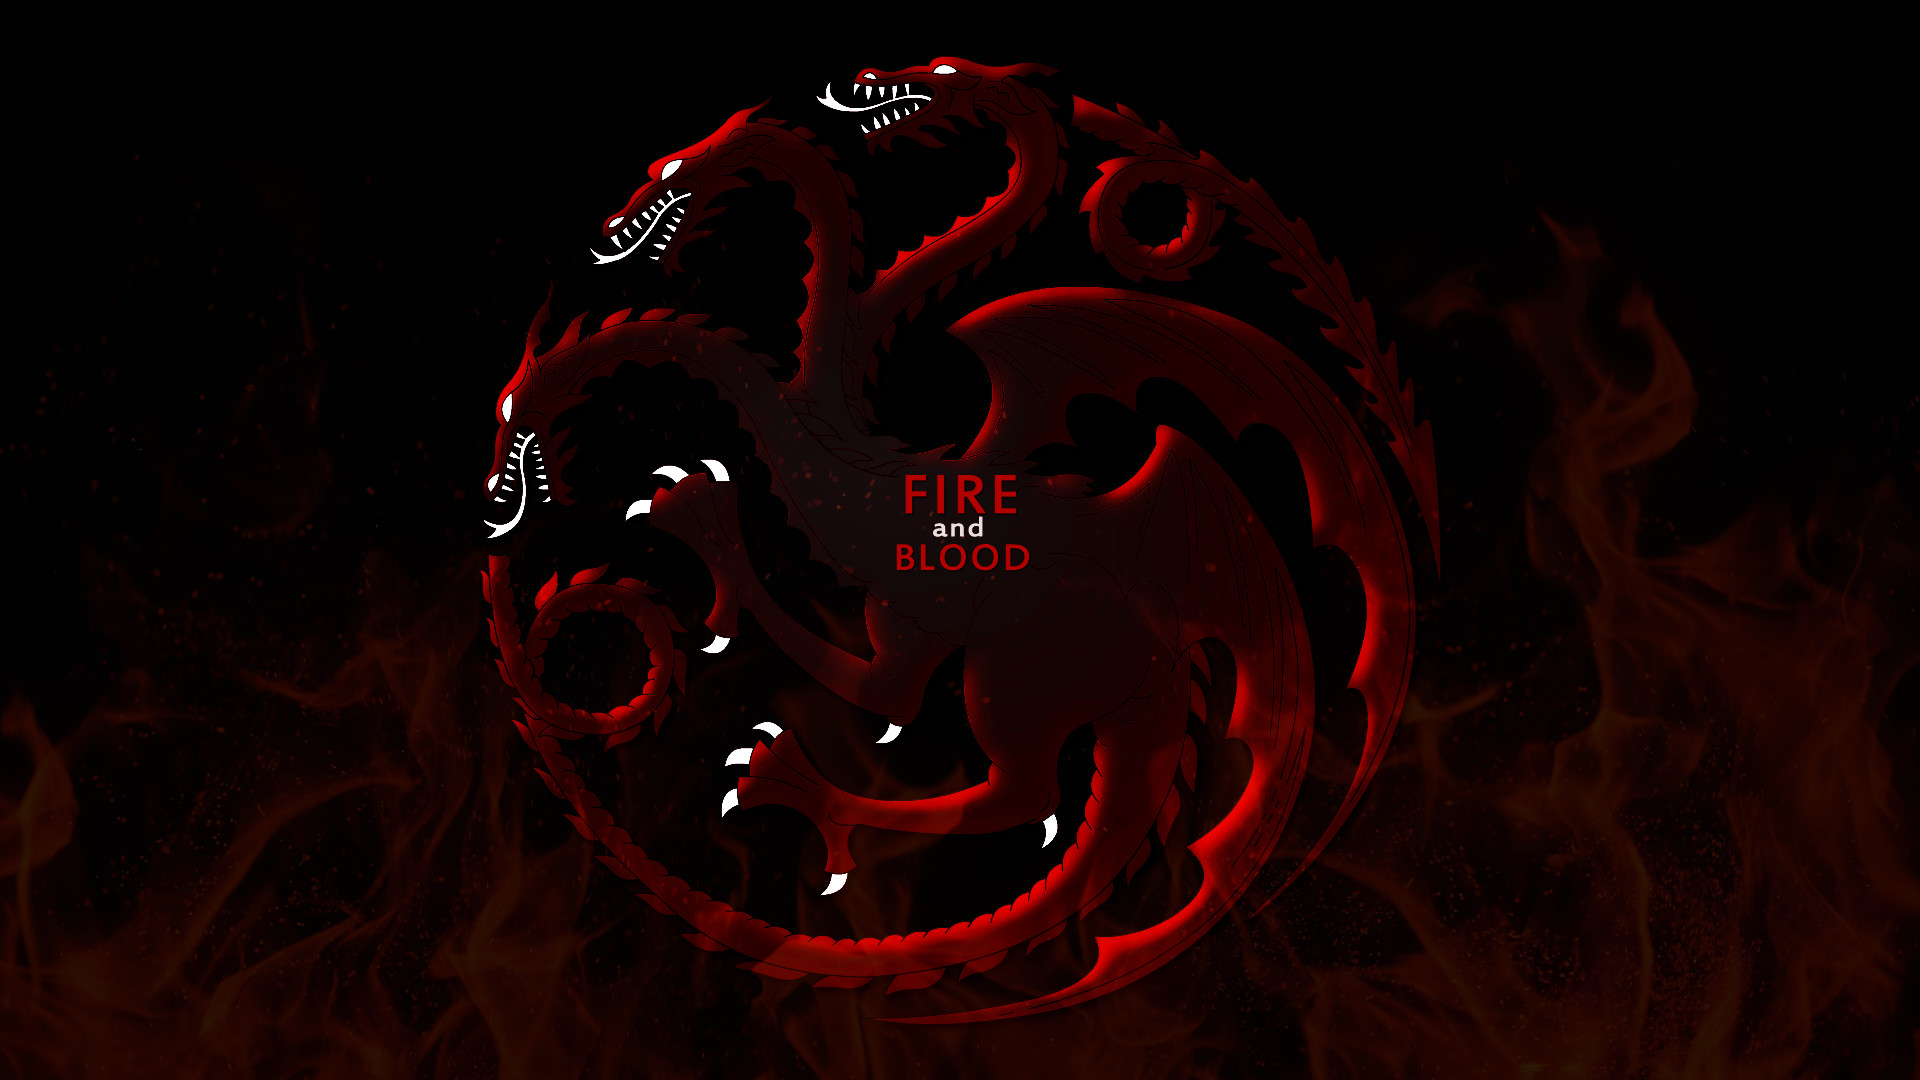 House Targaryen Wallpaper- The Three Headed Dragon by .